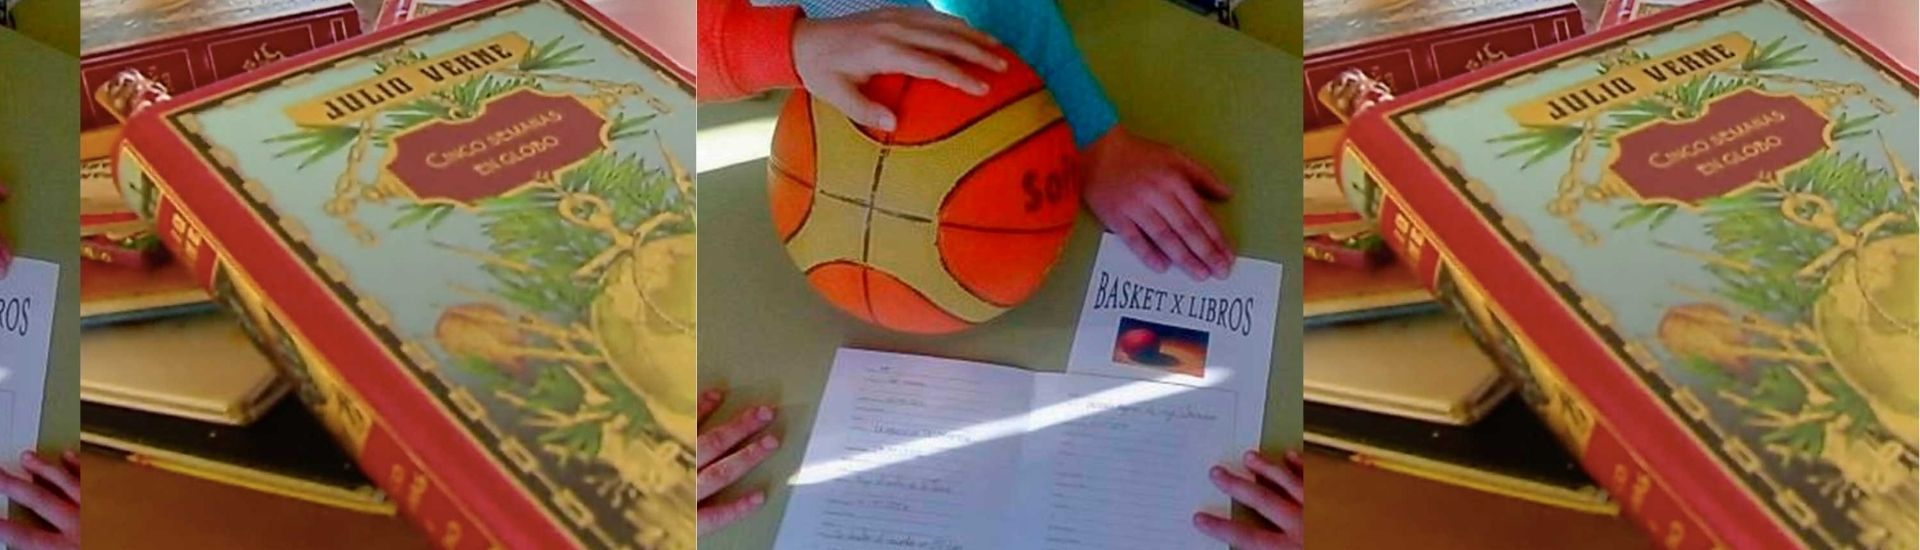 Imagen del album de basquetball